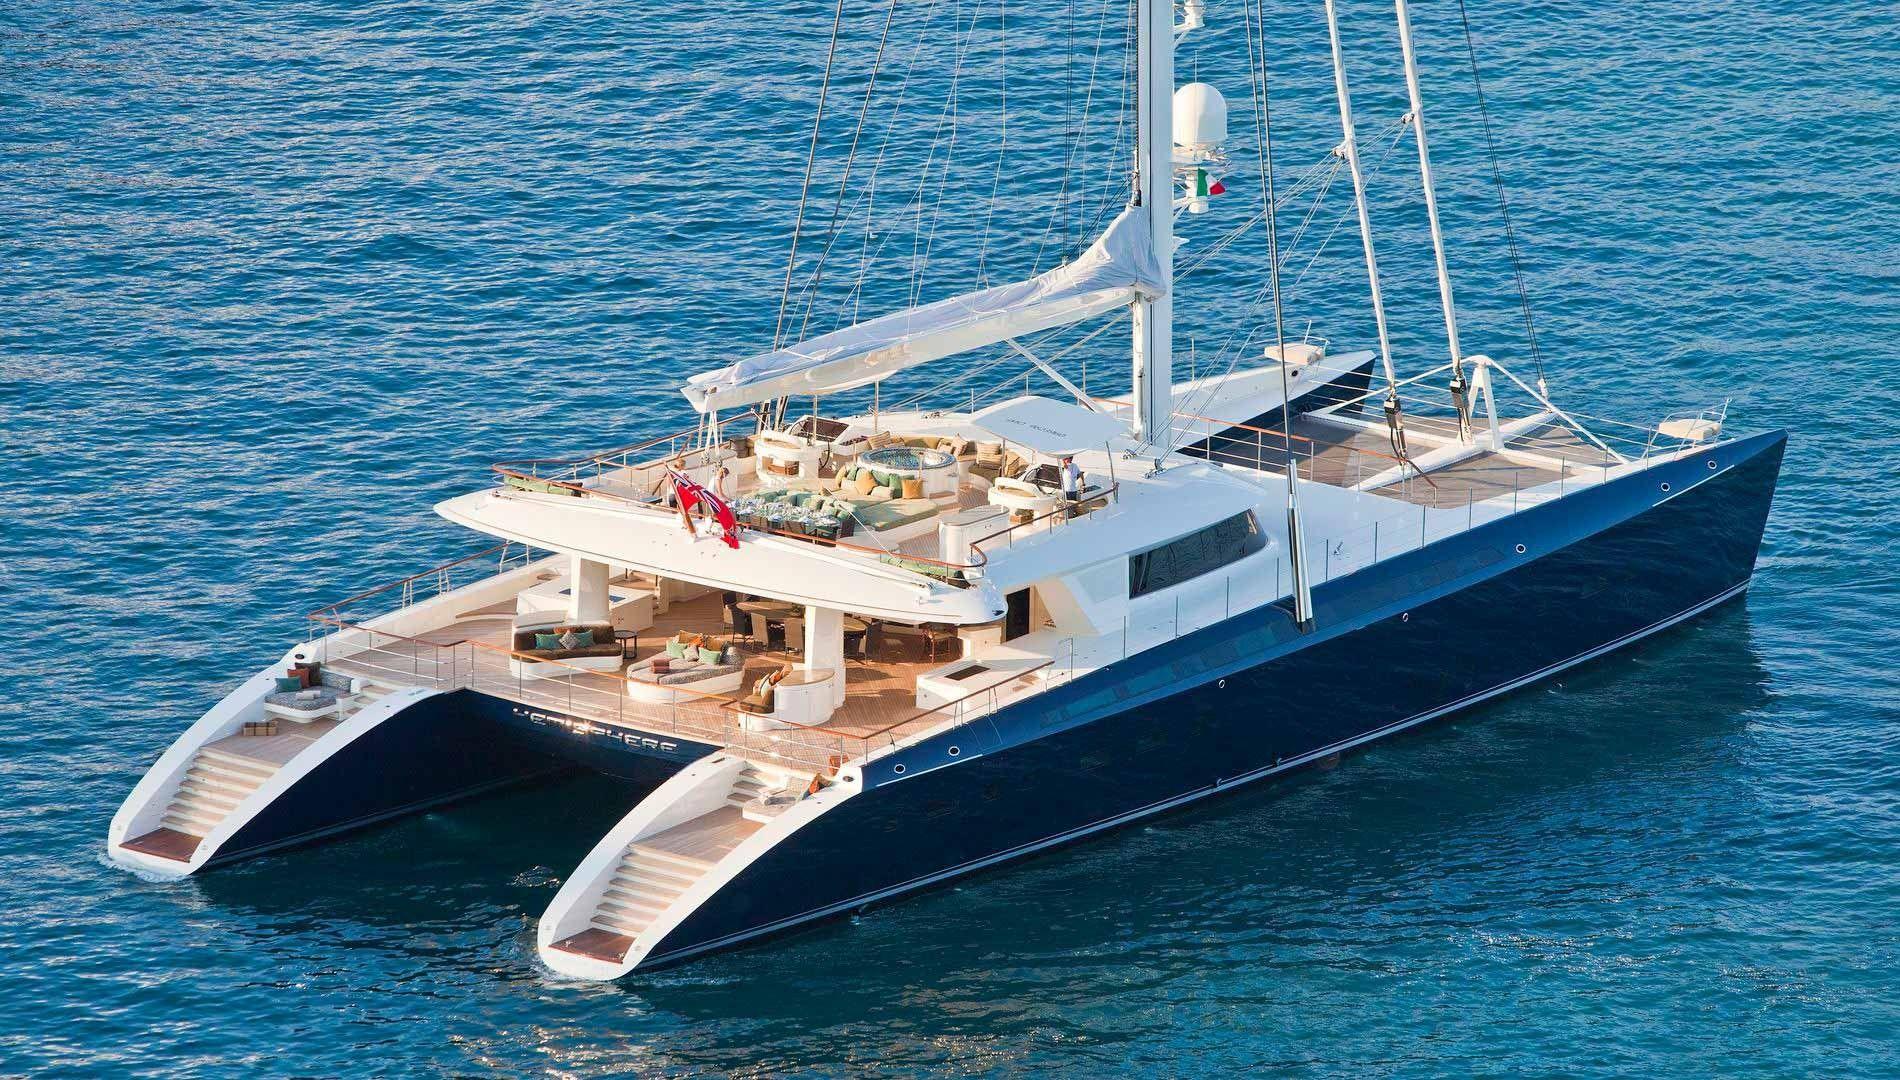 Katamaran segeln luxus  HEMISPHERE Superyacht | Luxury Sail Yacht for Charter with Burgess ...